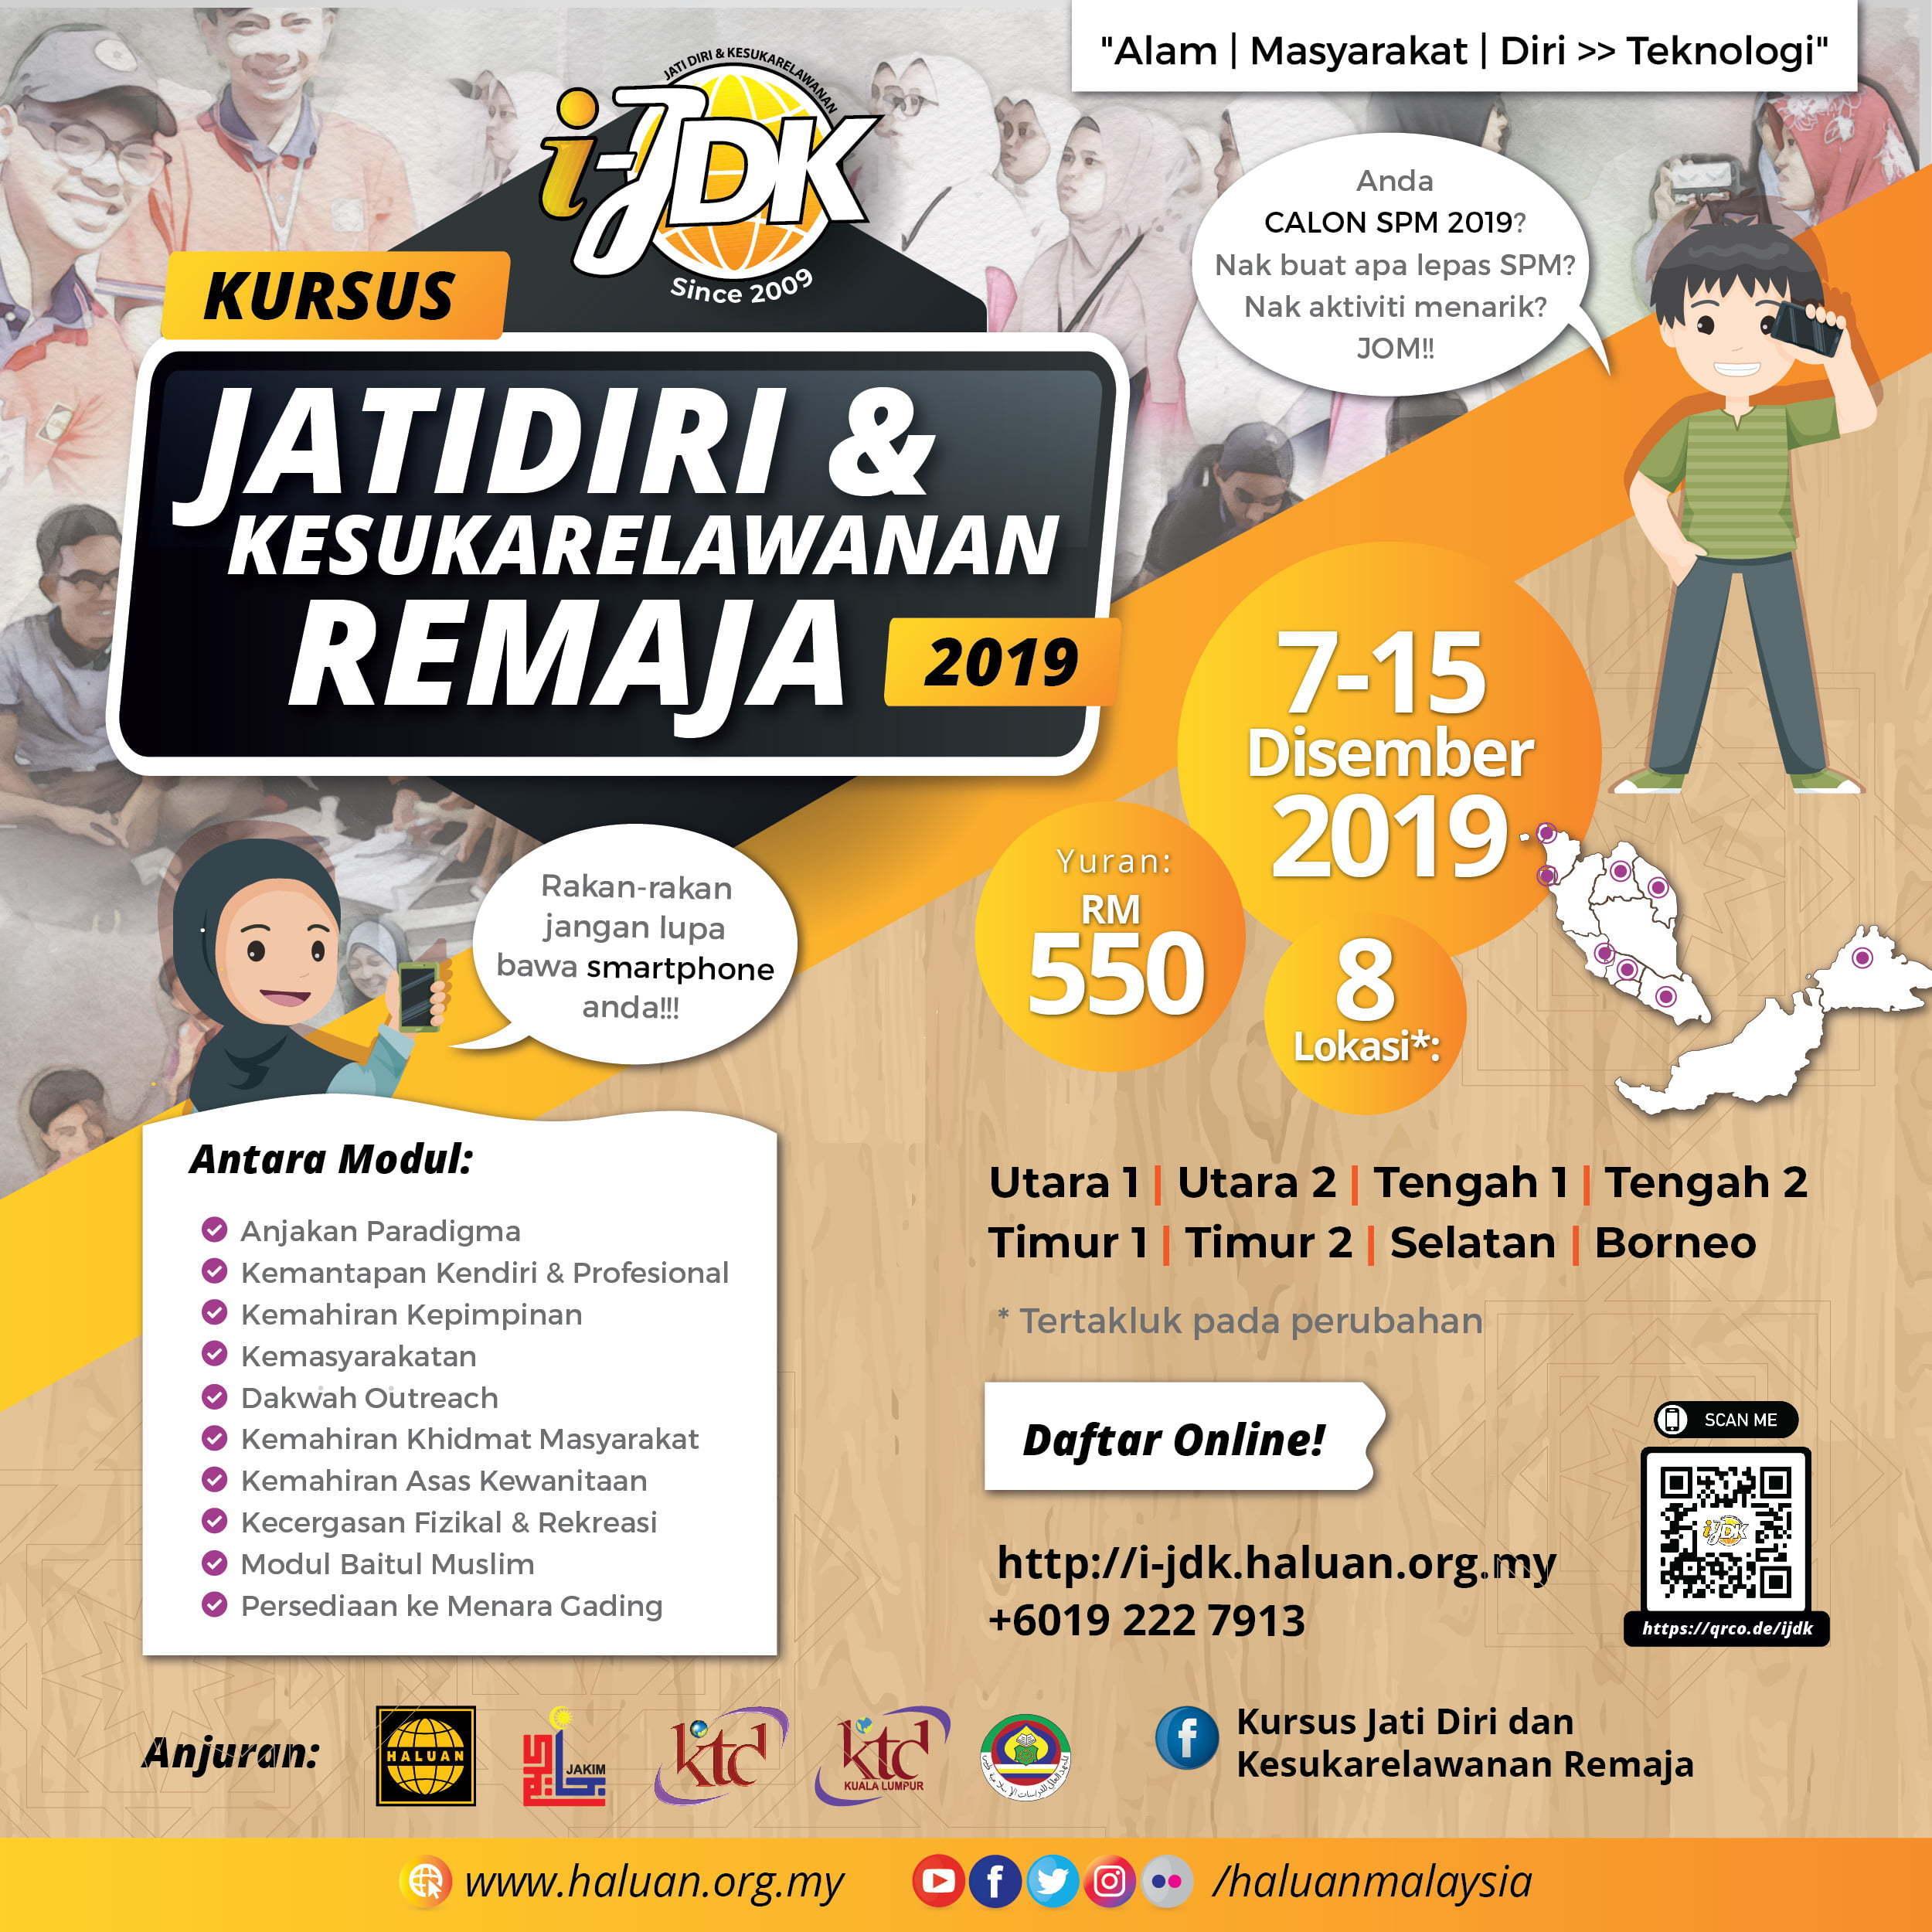 Kursus Jati Diri & Kesukarelawanan Remaja (i-JDK) 2019